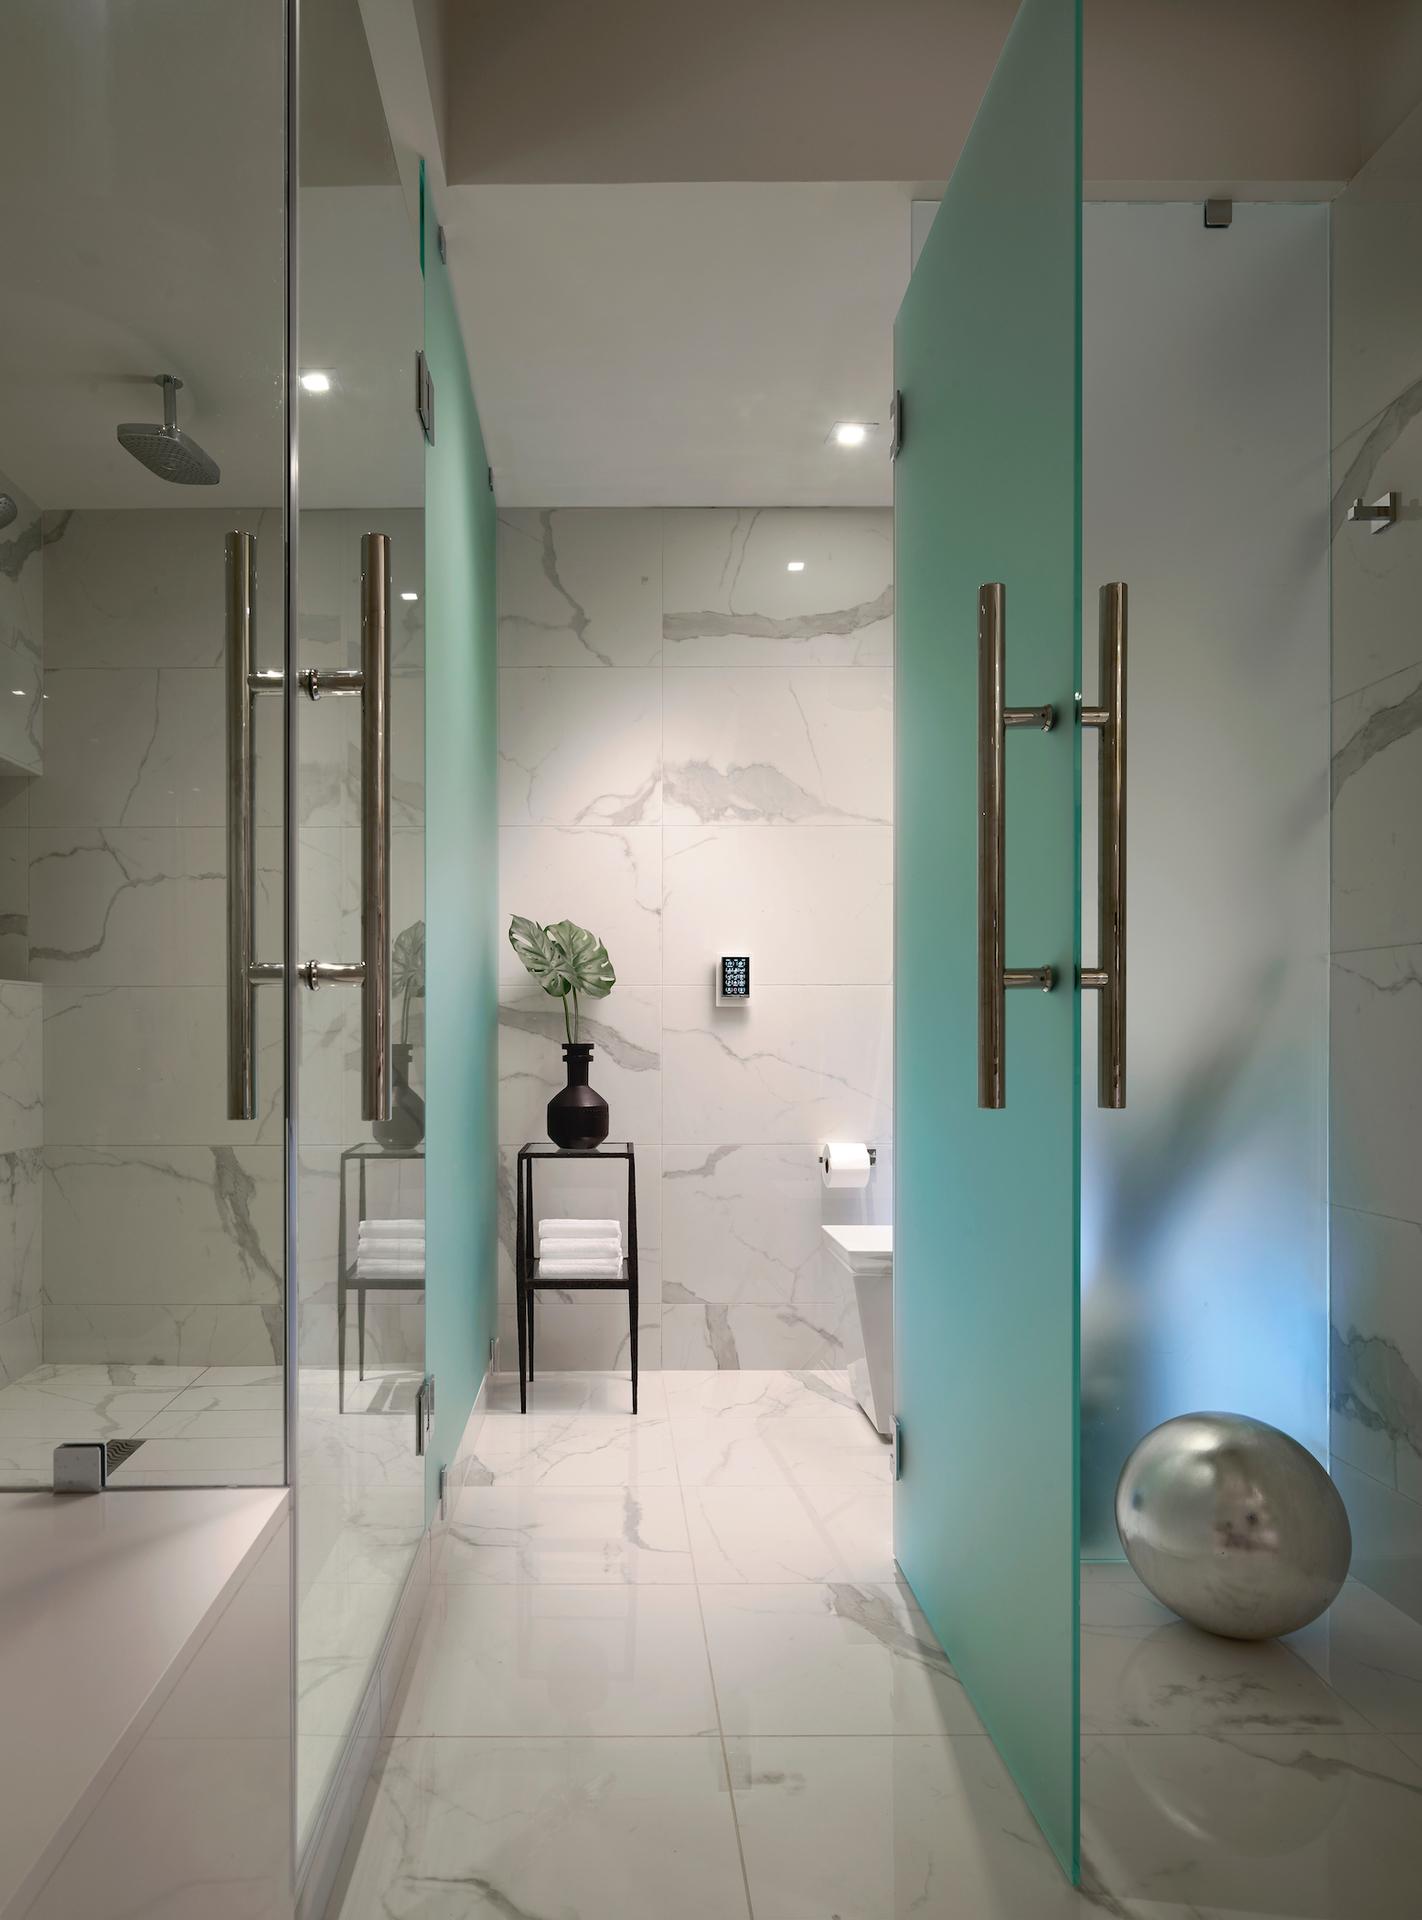 A master bathroom design featuring marble materials that creates an elegant, modern feel at Privé at Island Estates in Miami, Florida.